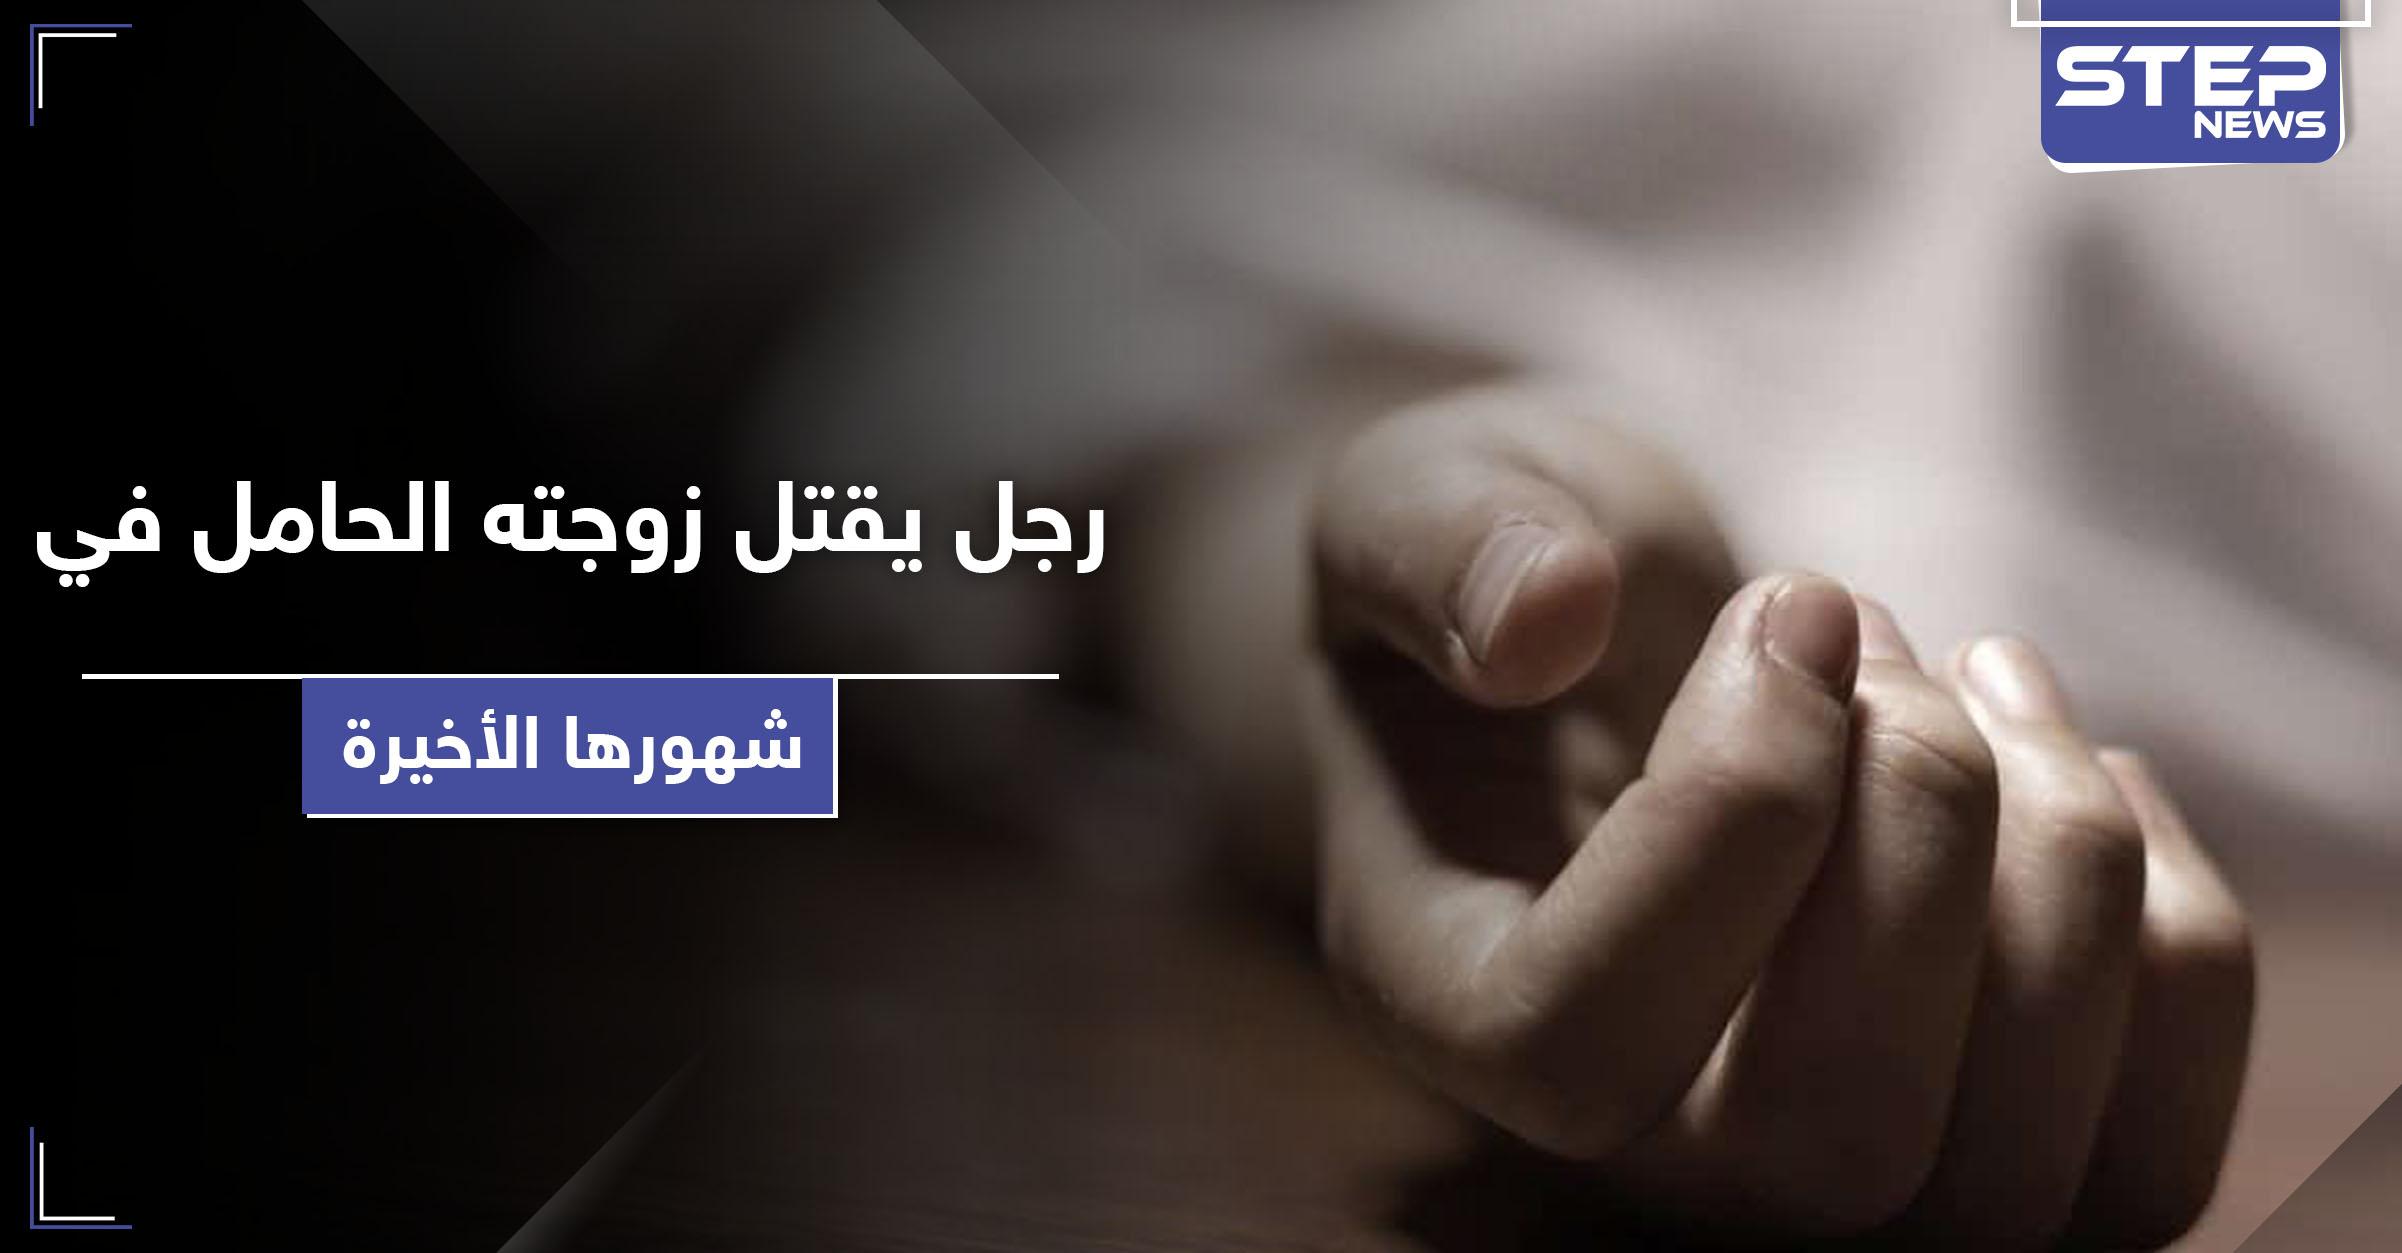 رجل يقتل زوجته الحامل بـ دمشق